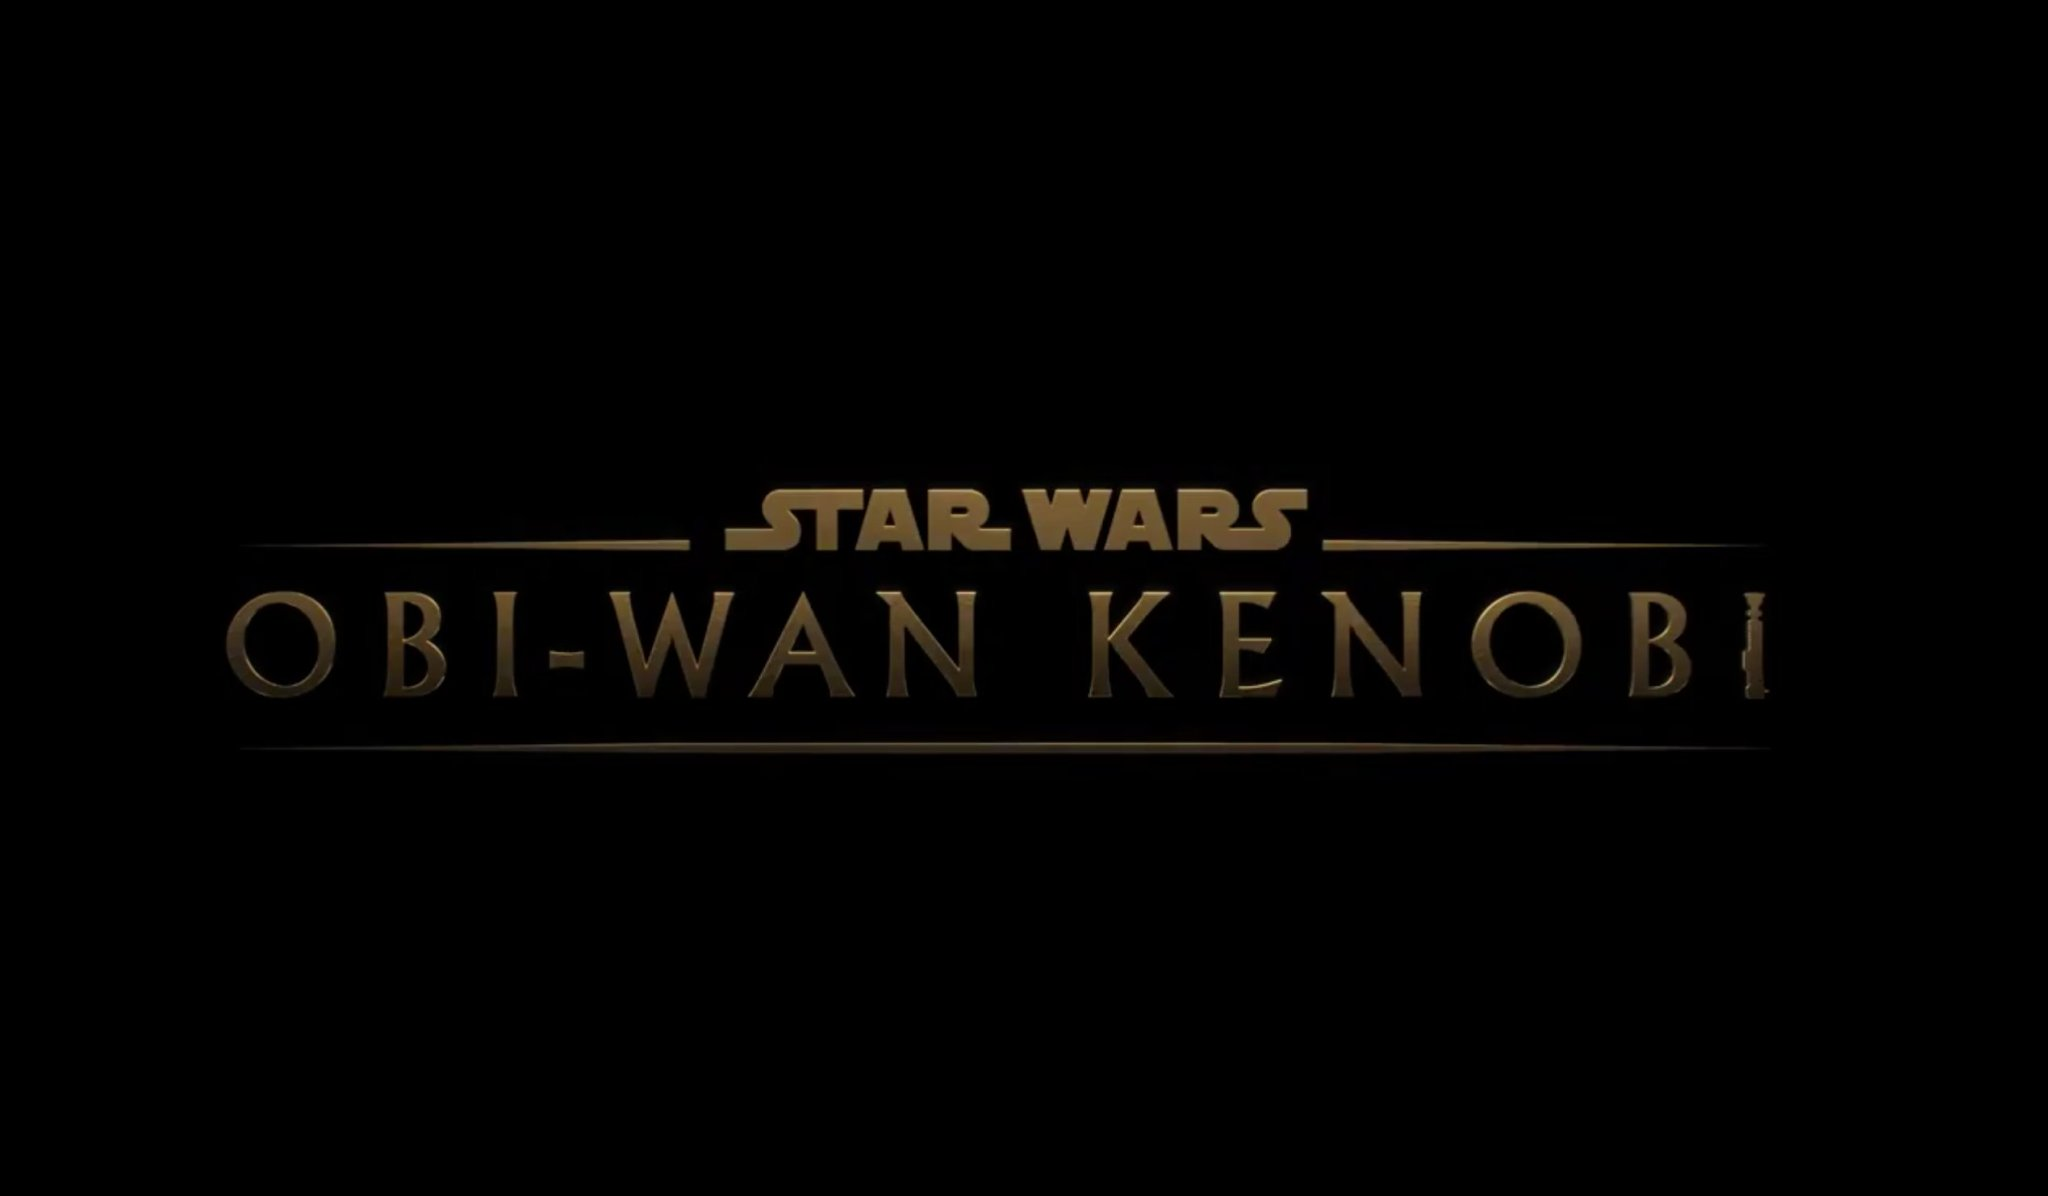 Obi-Wan Kenobi Series: Full Cast Of The Star Wars Spinoff Announced